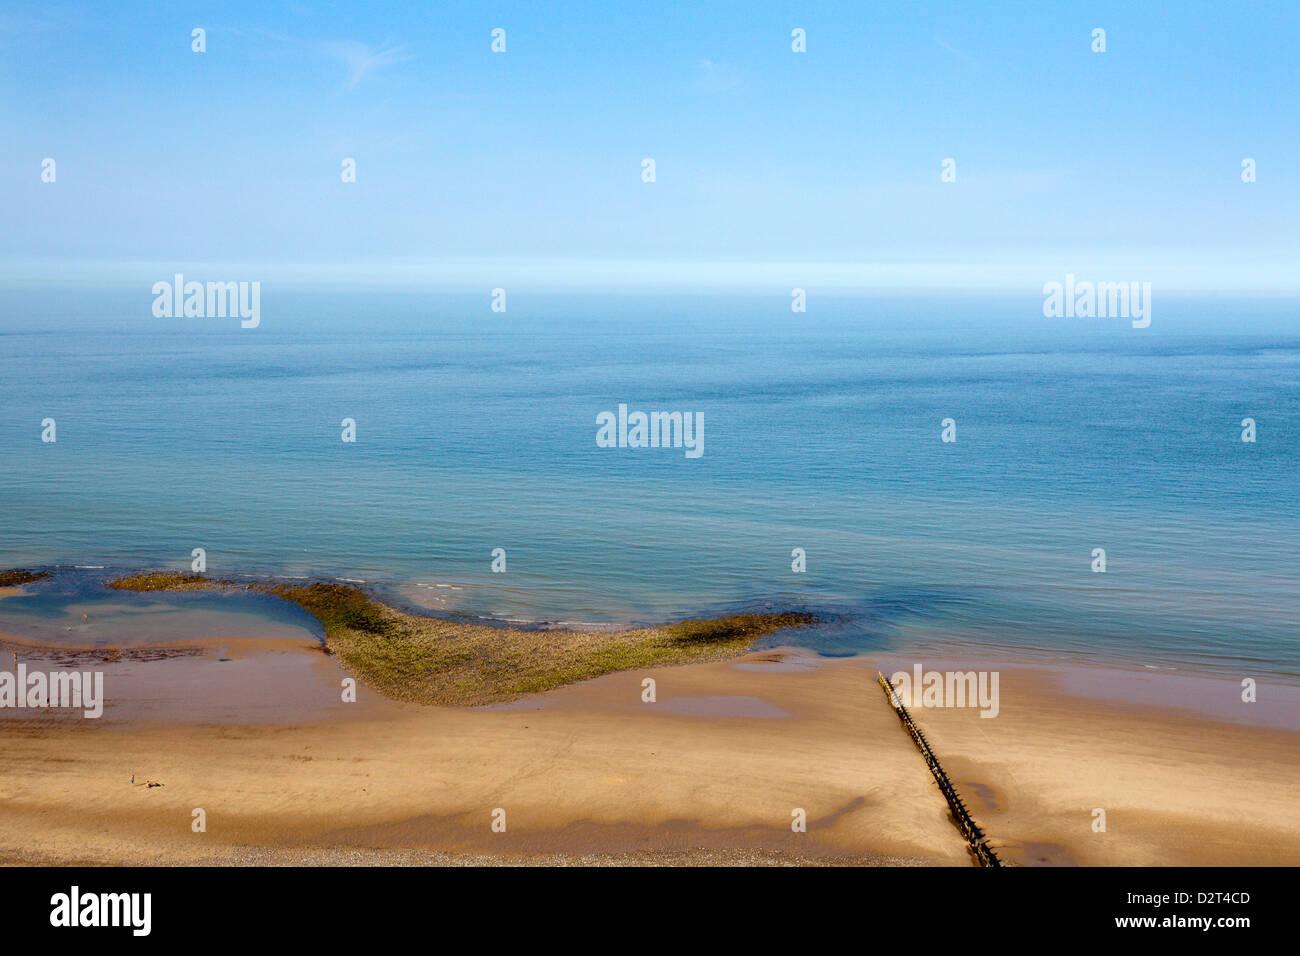 Quiet Beach between Cromer and Overstrand, Norfolk, England, United Kingdom, Europe - Stock Image